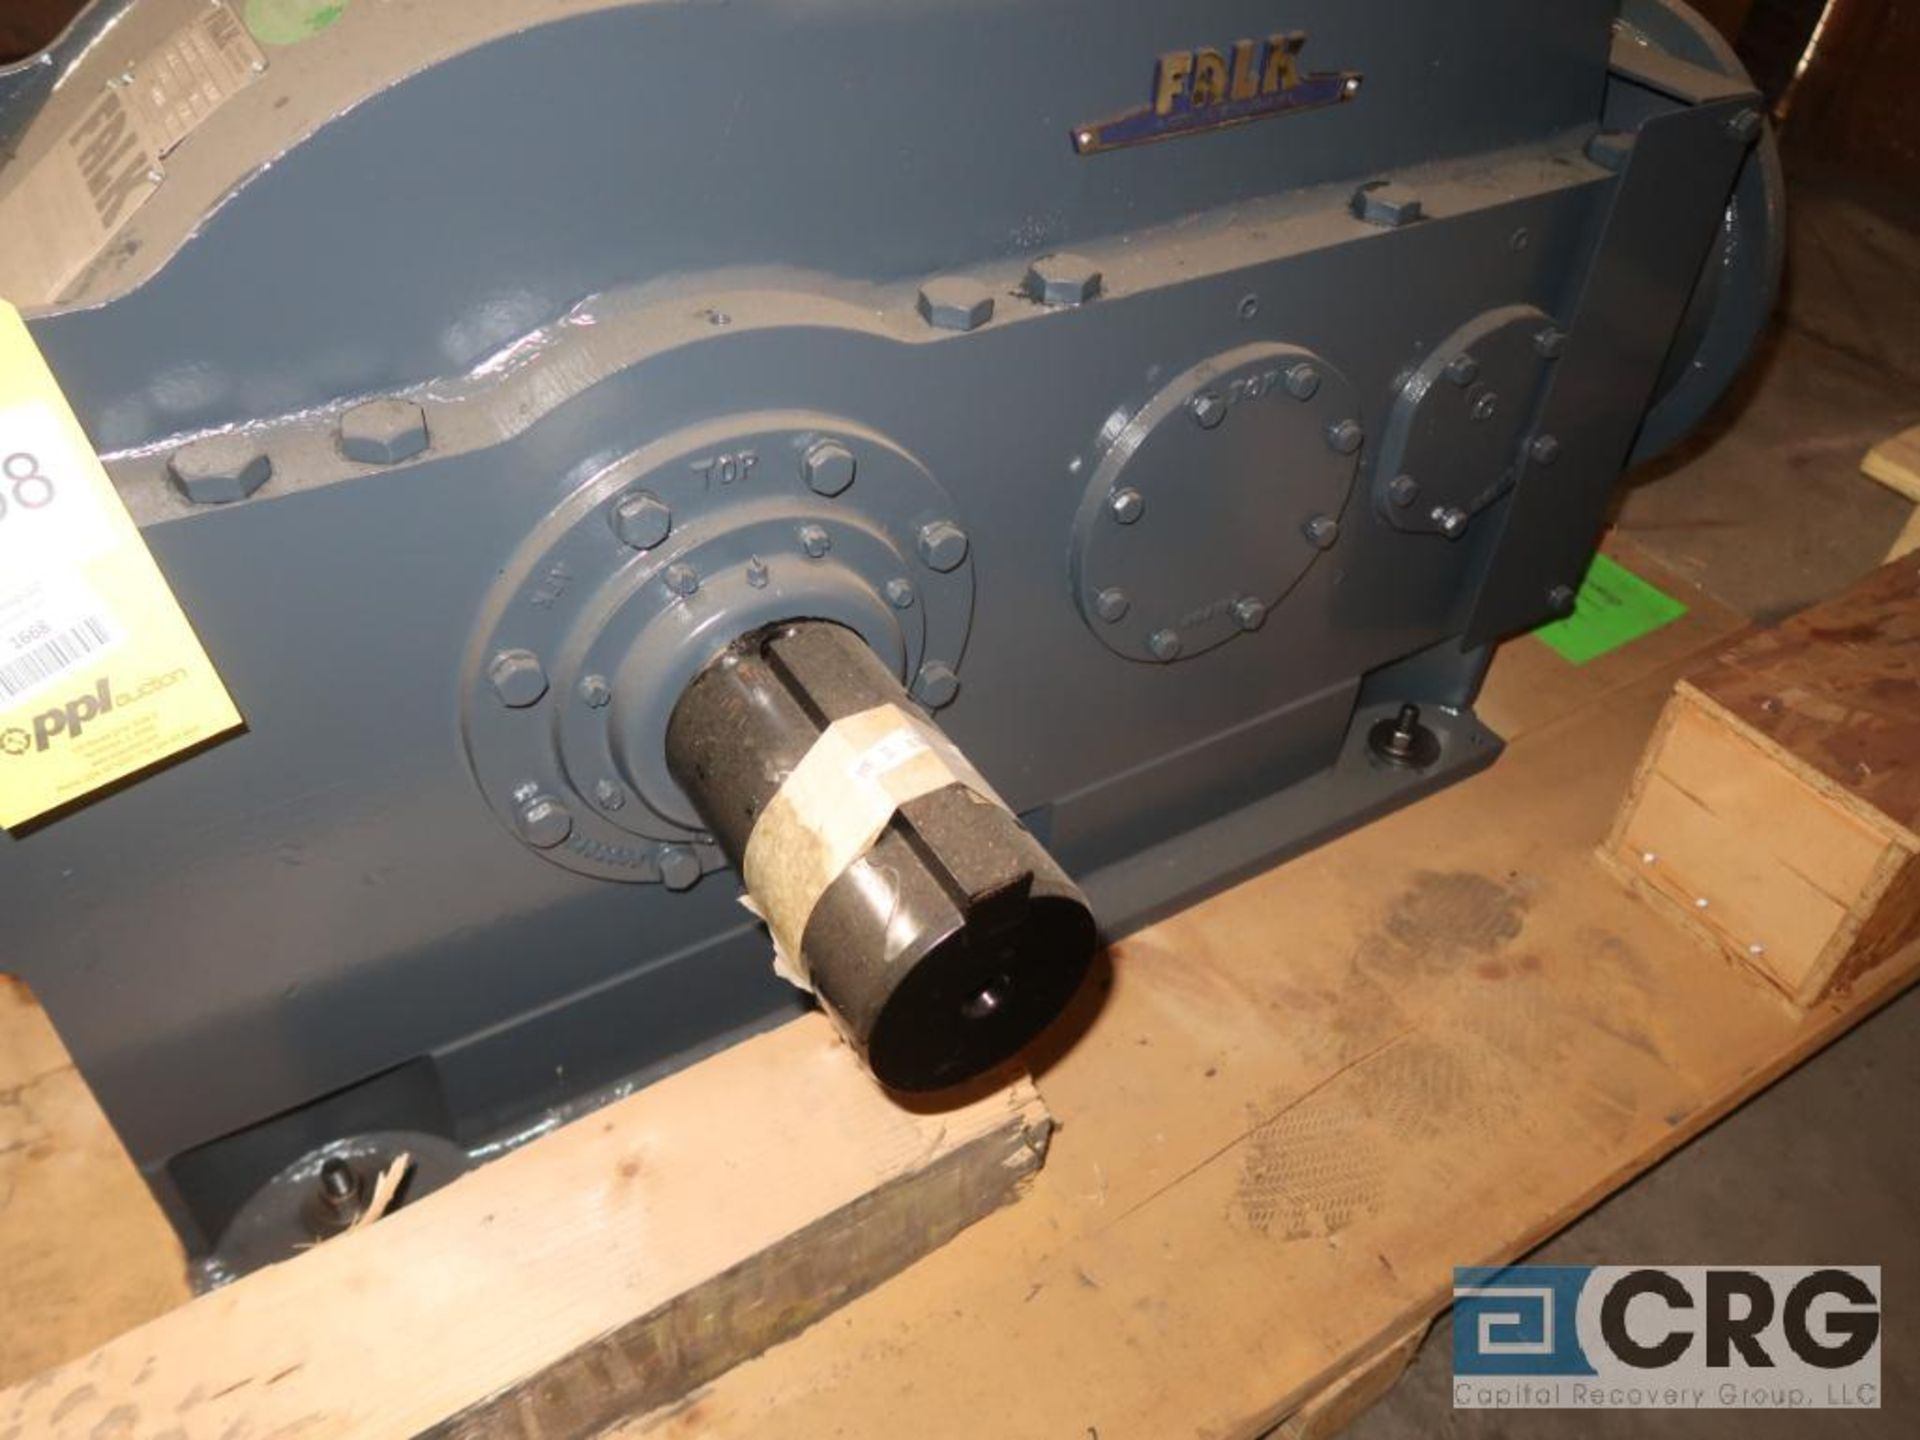 Falk 2080YB2LB gear drive, ratio-8.442, input RPM 2,153, output RPM 255.3, service rate HP. 75, s/